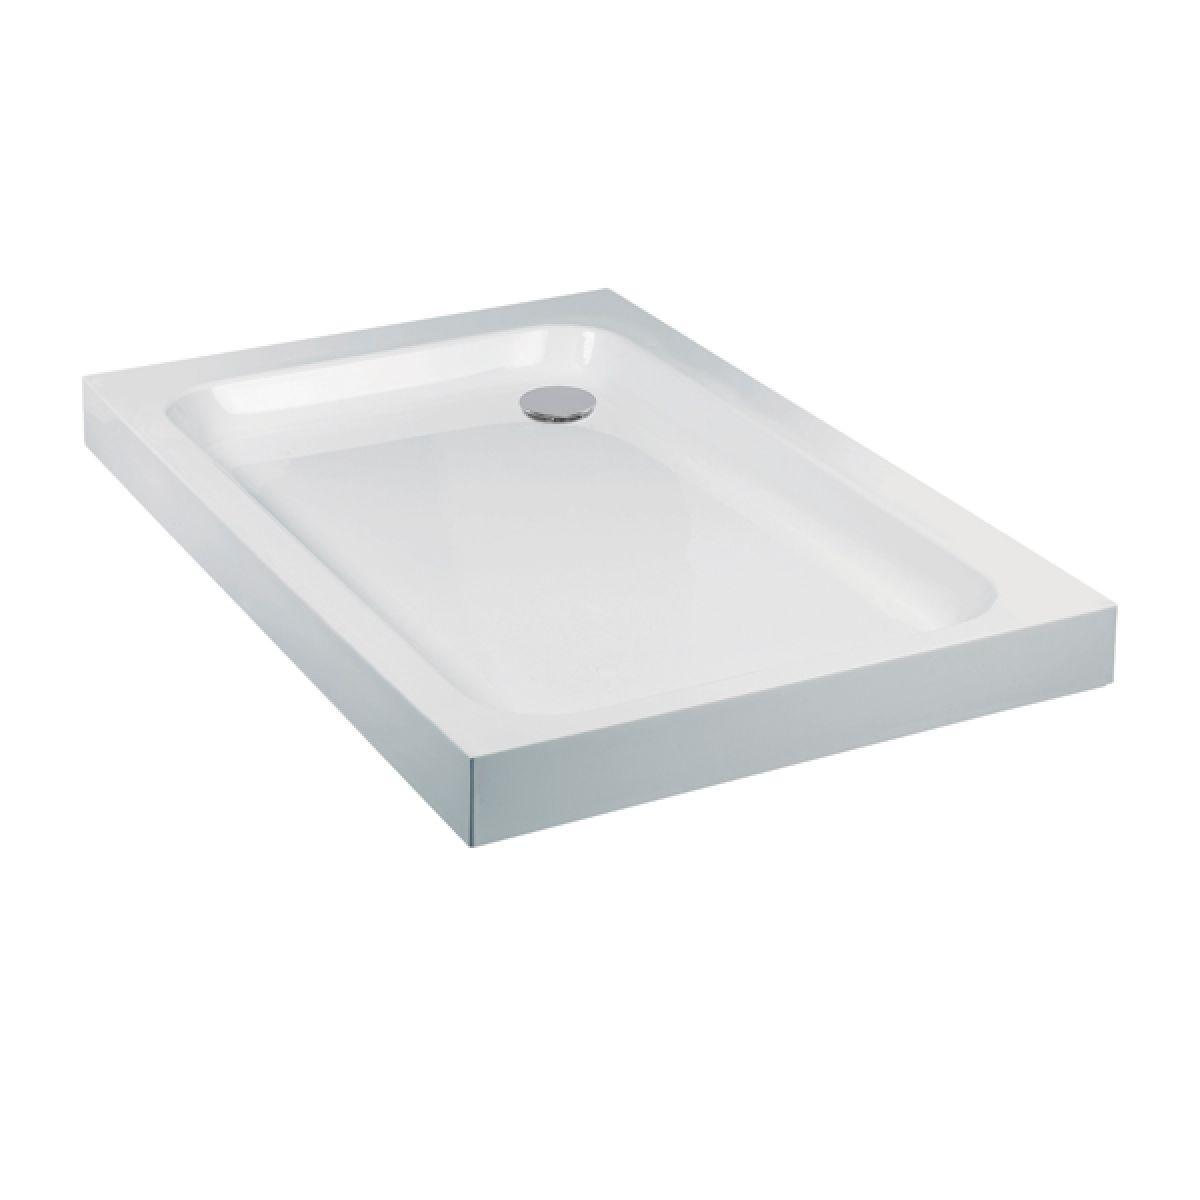 Frontline Standard Rectanglular Shower Tray 1600 x 800mm